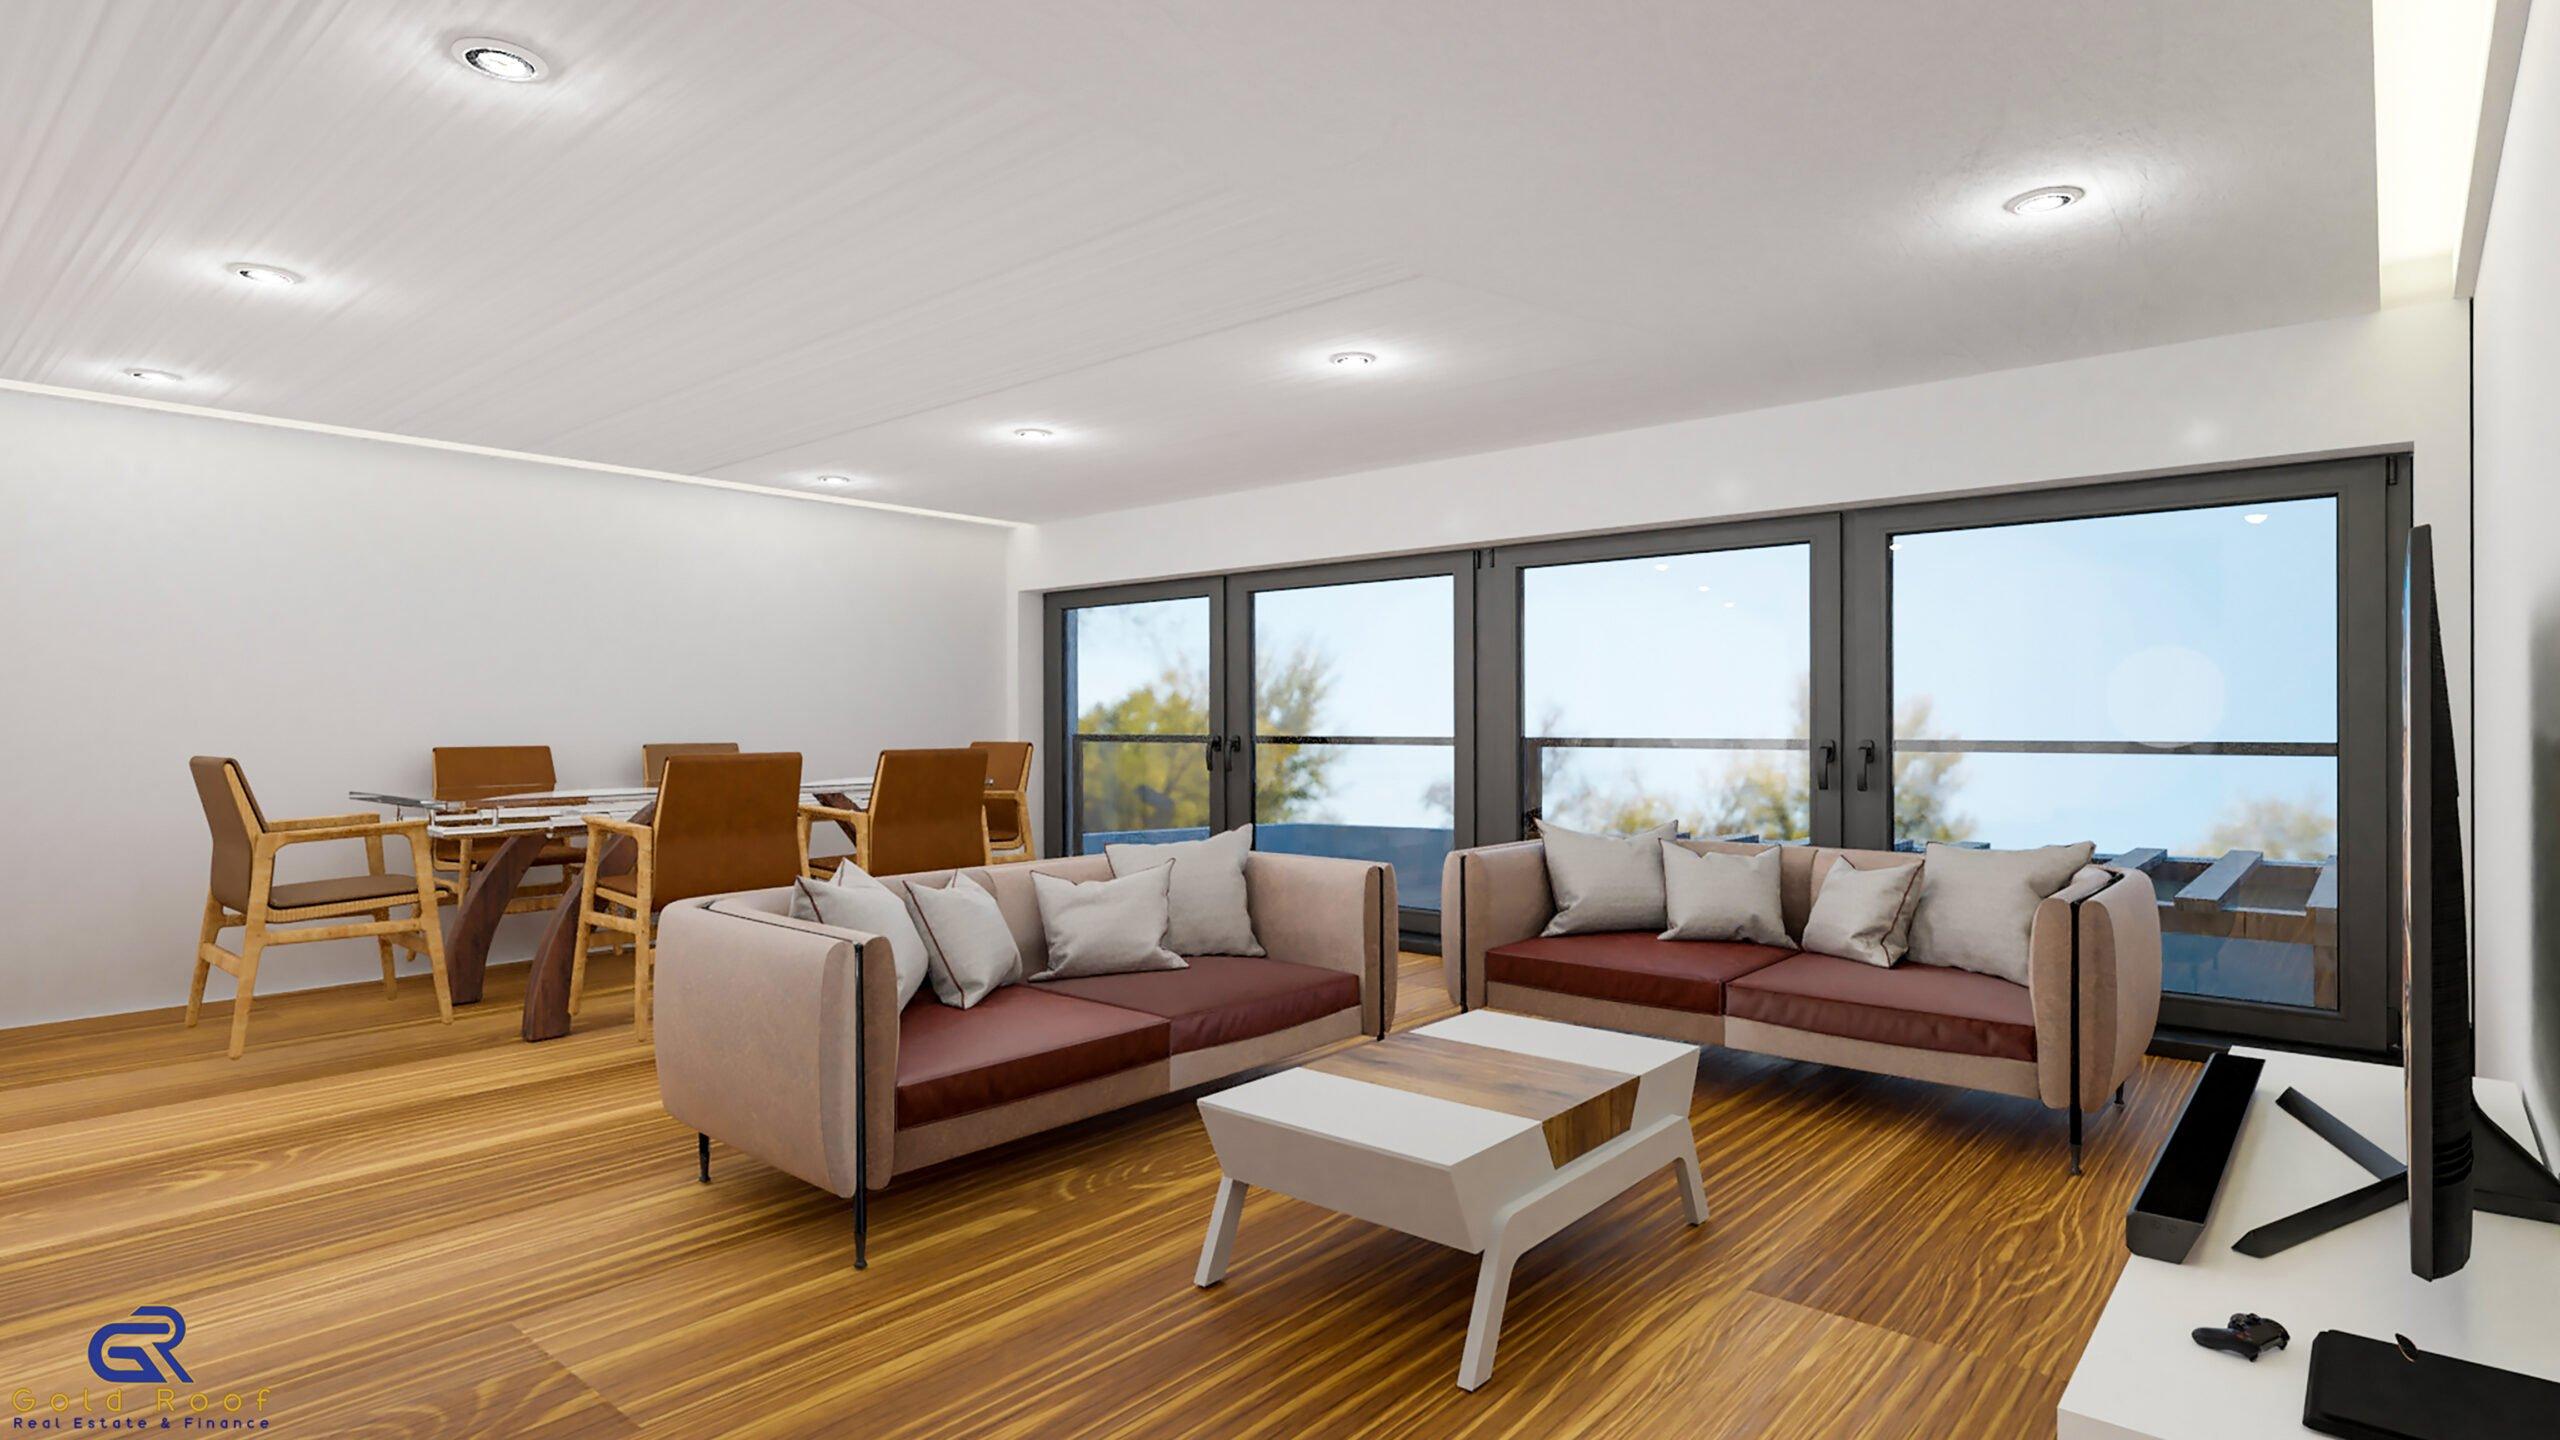 Villa de 4 chambres avec terrasse et jardin, 3 façades, Arcozelo, VN Gaia – VENDU